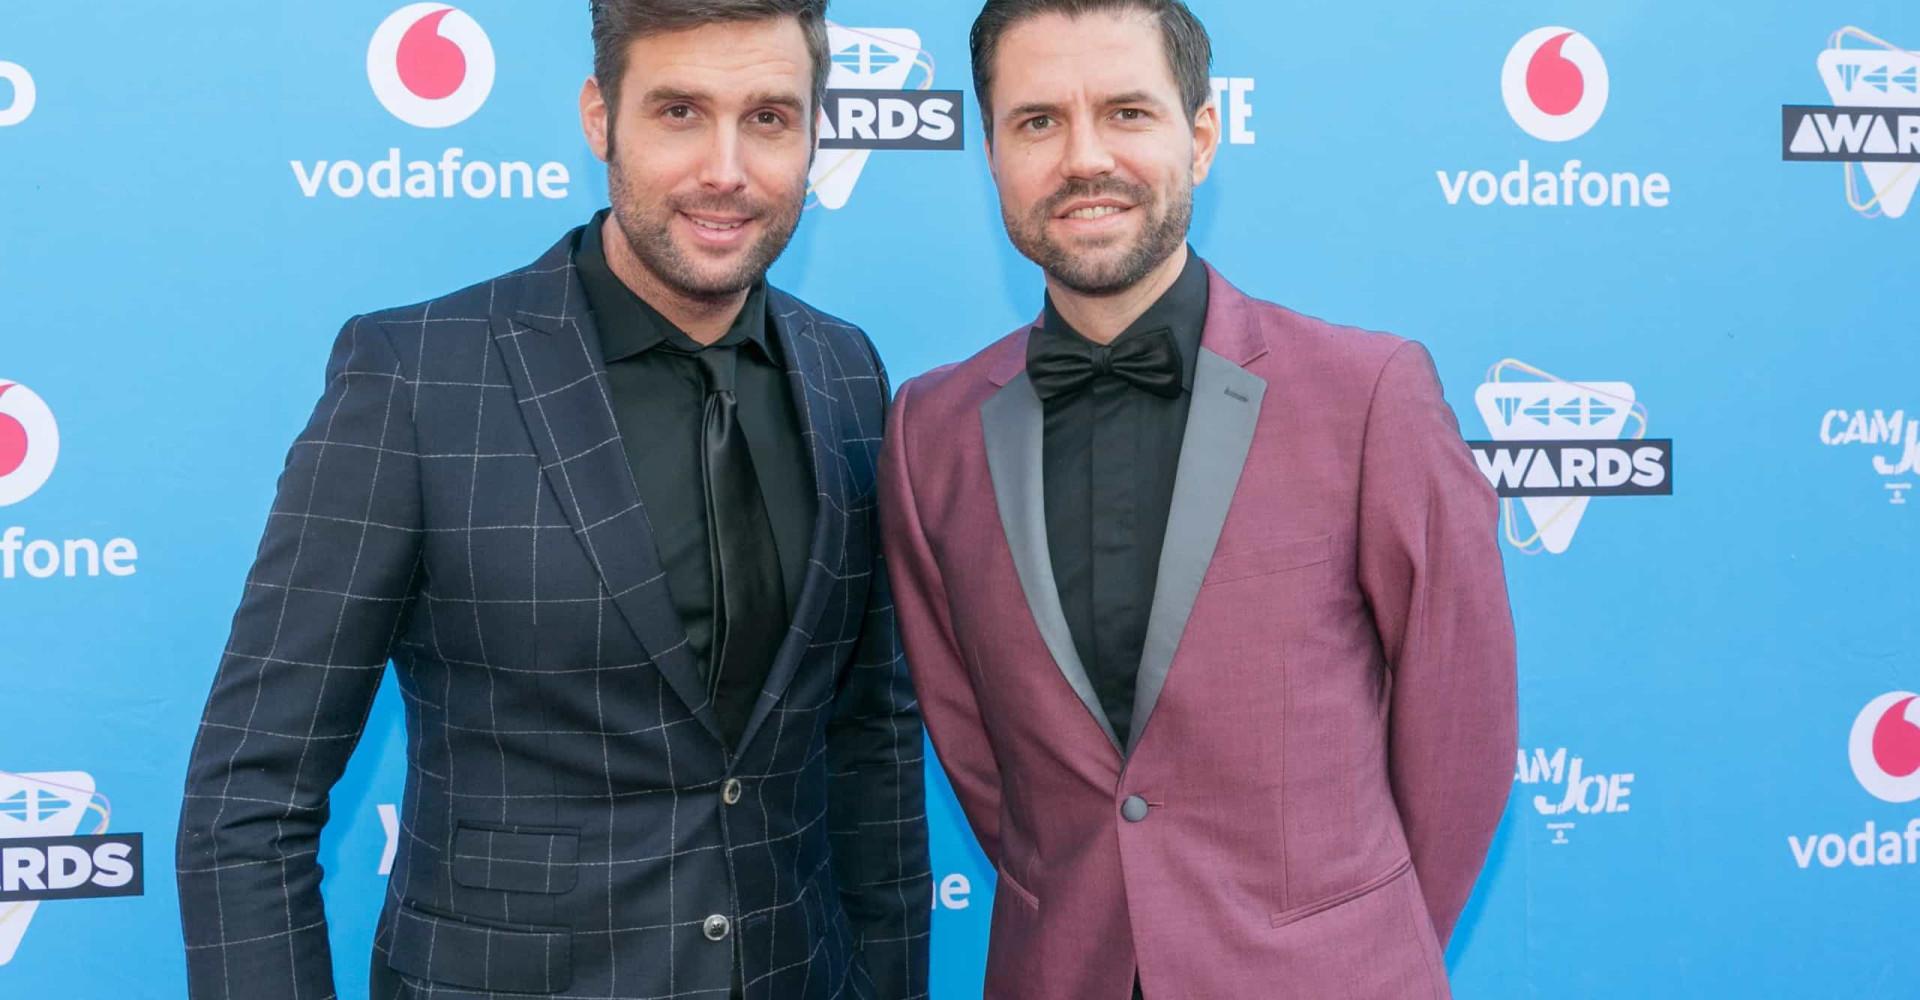 Houd jij Nick en Simon uit elkaar?